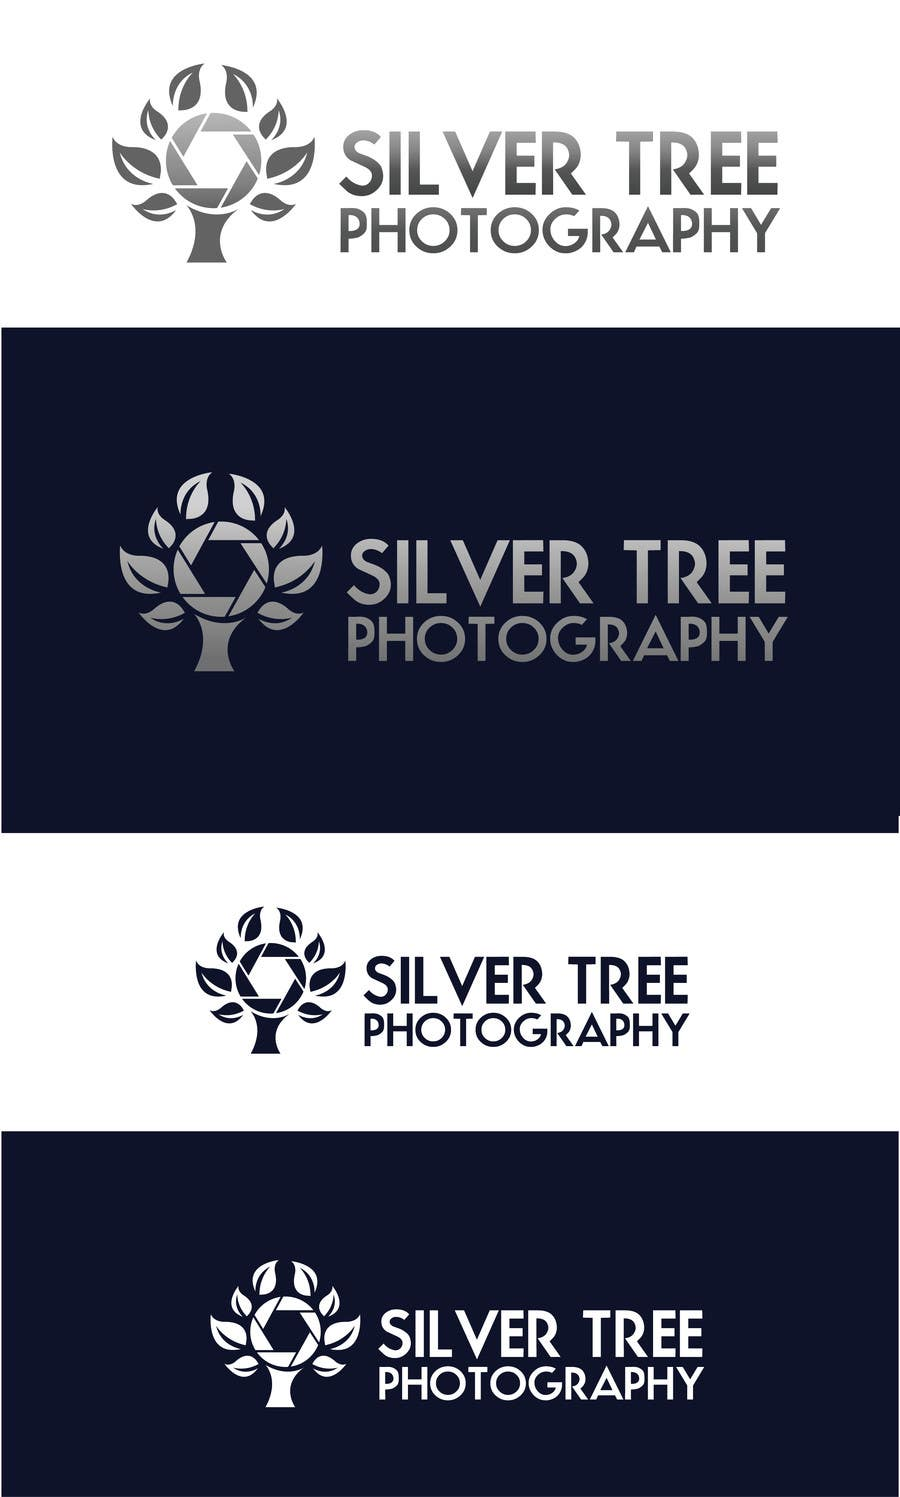 Bài tham dự cuộc thi #                                        5                                      cho                                         Design A Logo for New Photographer - Silver Tree Photography